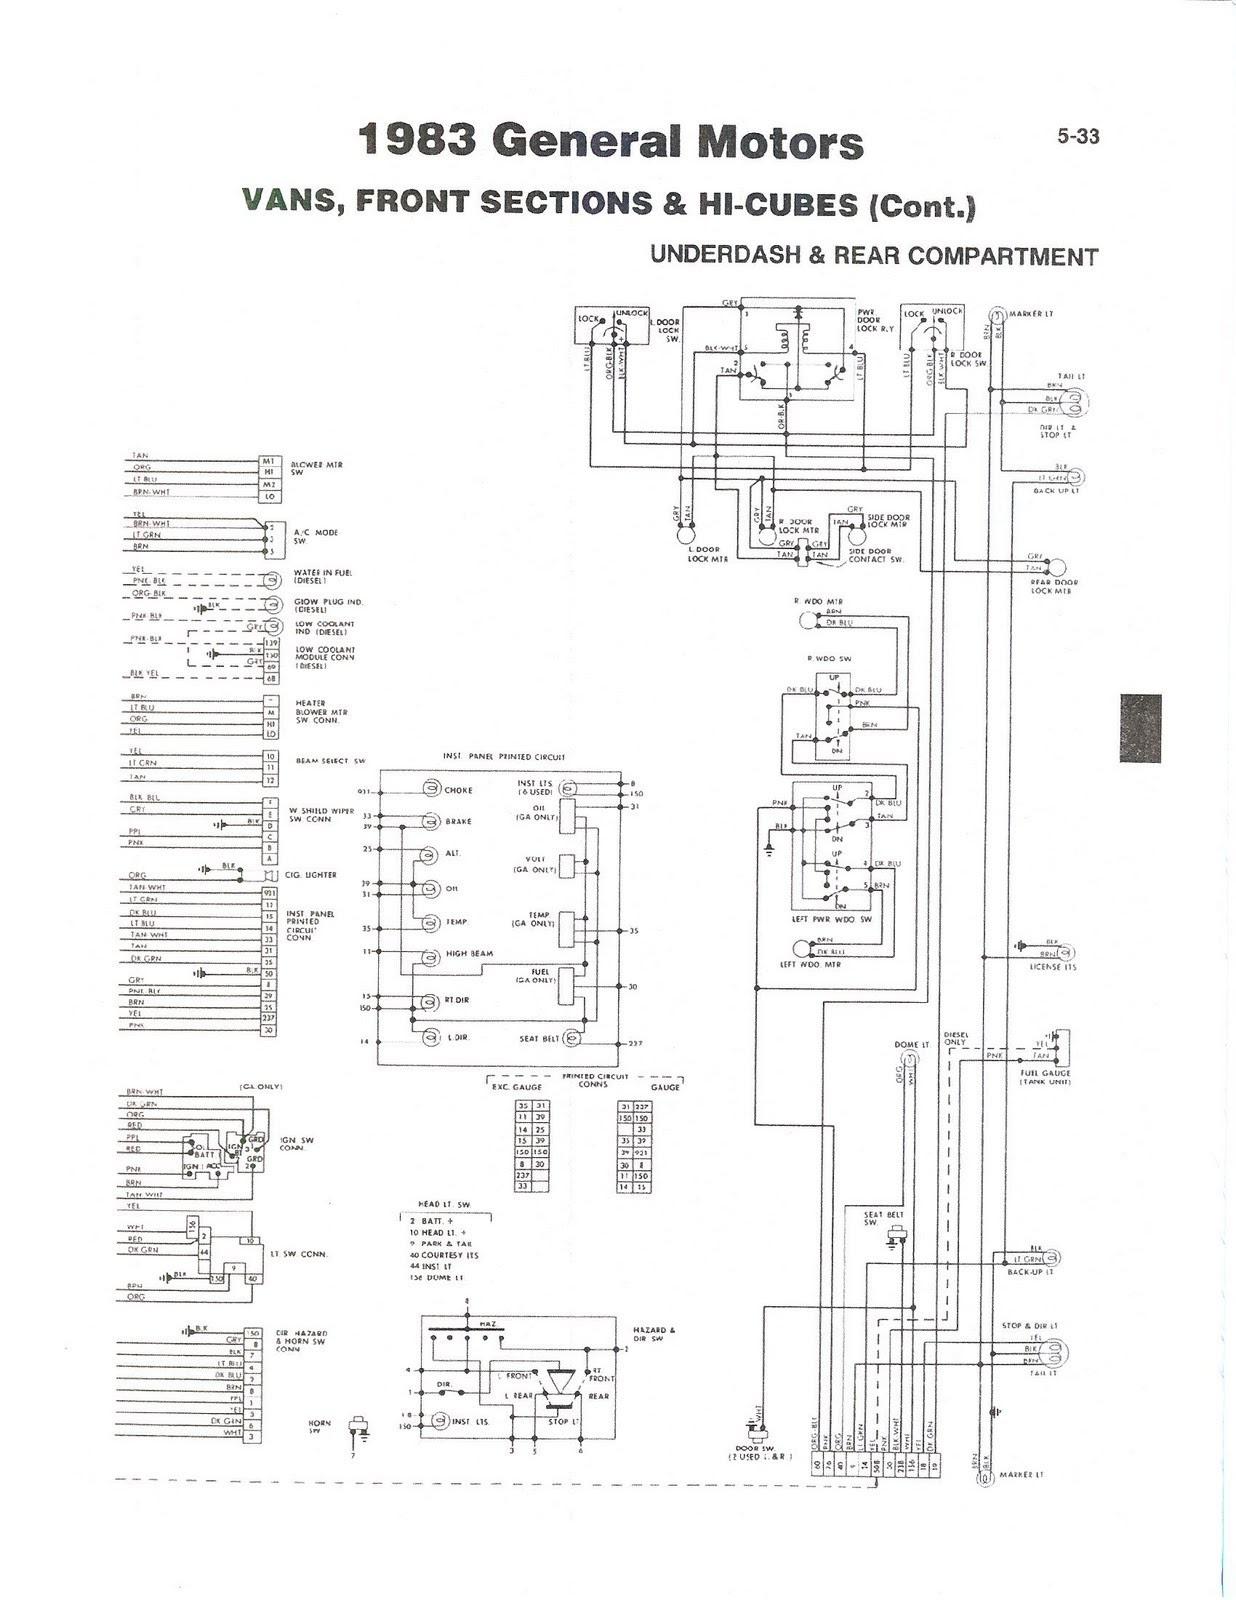 1982 Airstream Motorhome Battery Wiring Diagram Wiring Diagrams For Nema Configurations Duramaxxx Los Dodol Jeanjaures37 Fr